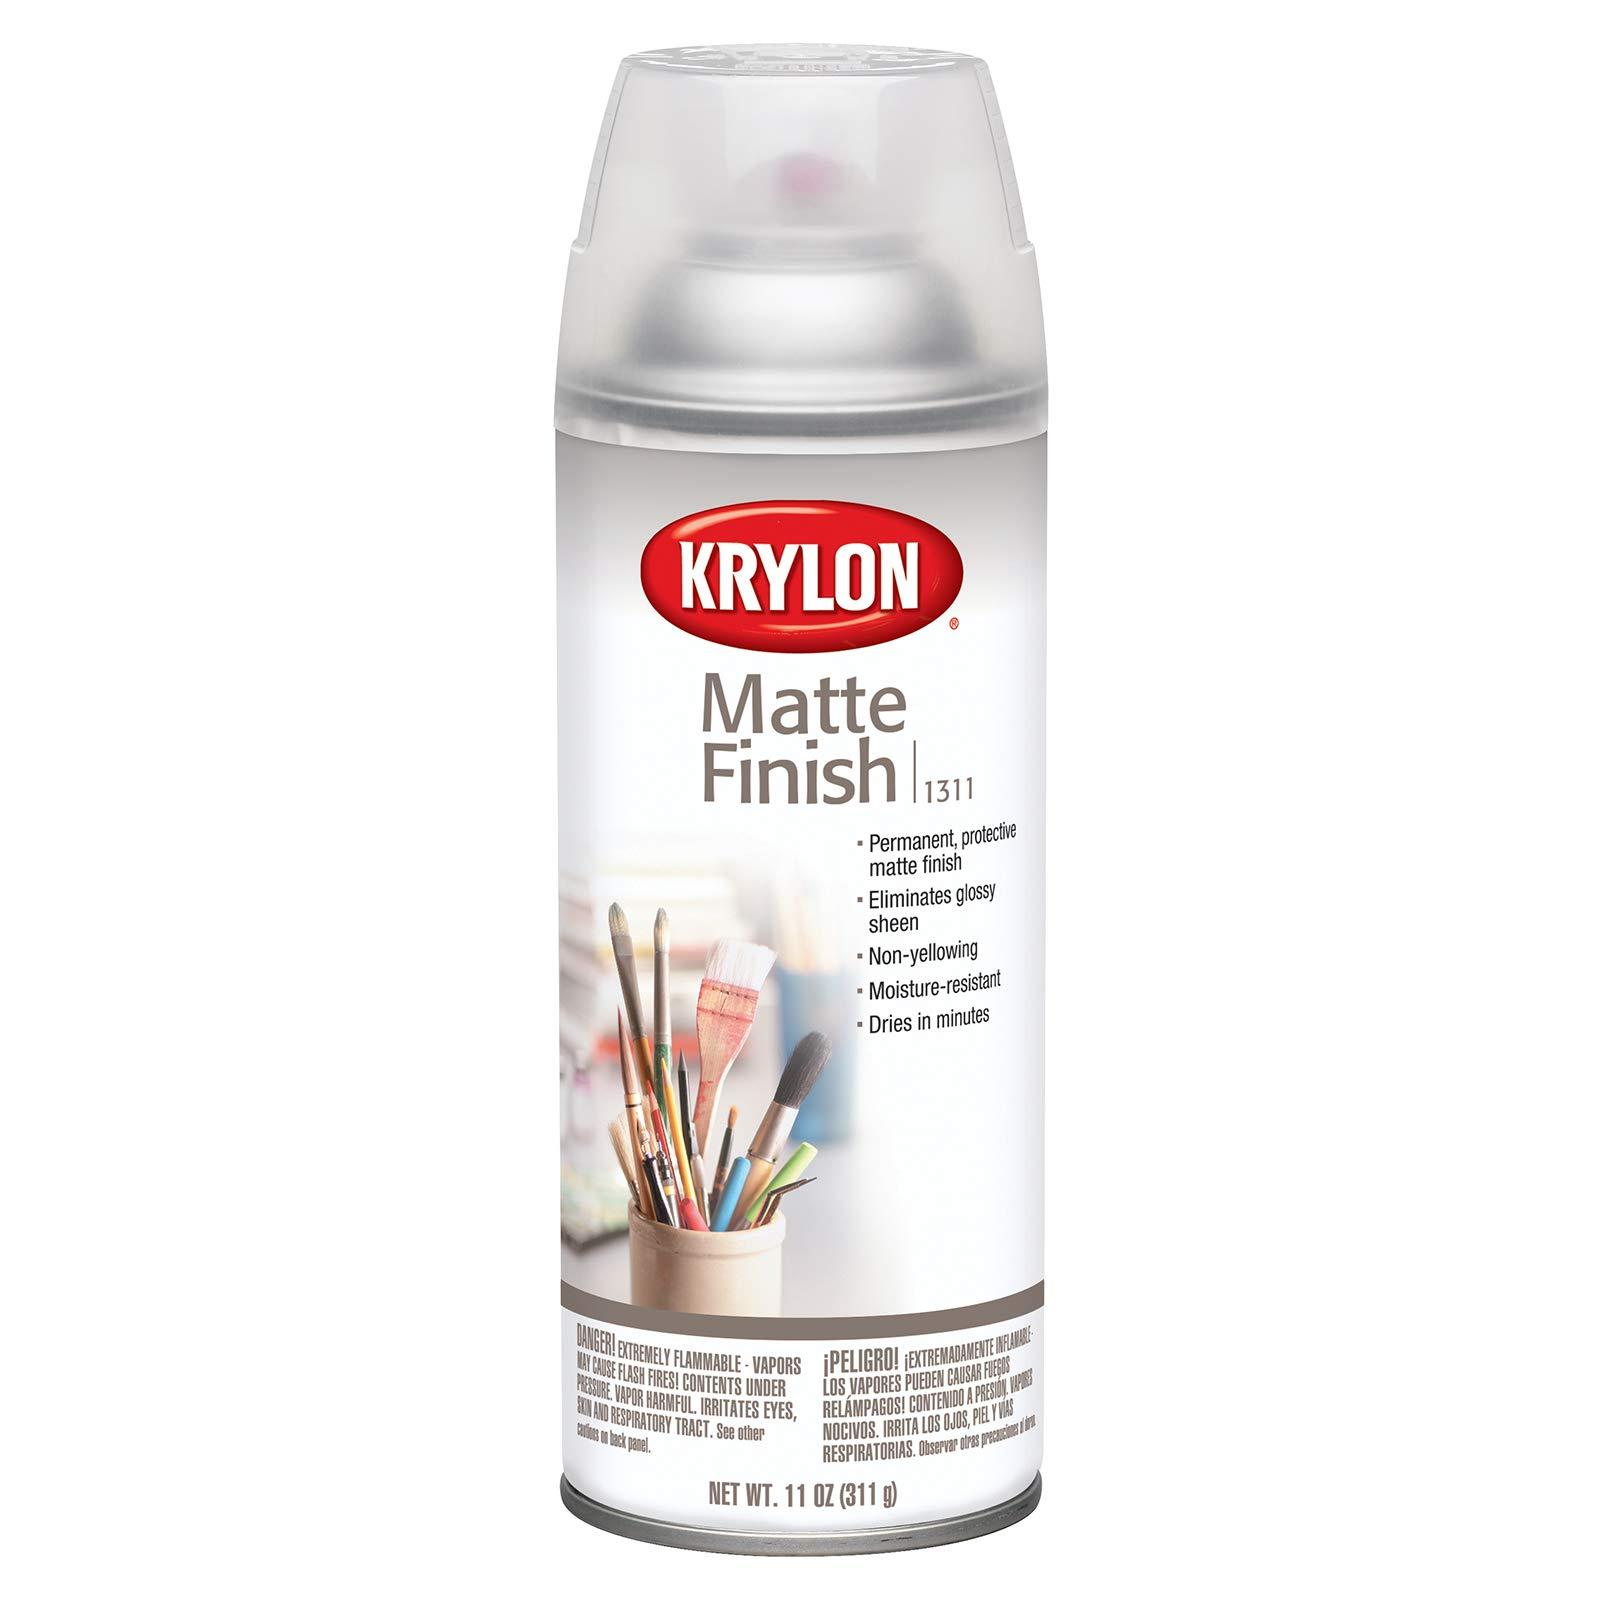 KRYLON DIVERSIFIED BRANDS K01311007 Matte Finish Spray Paint, 11 oz, 11 Oz